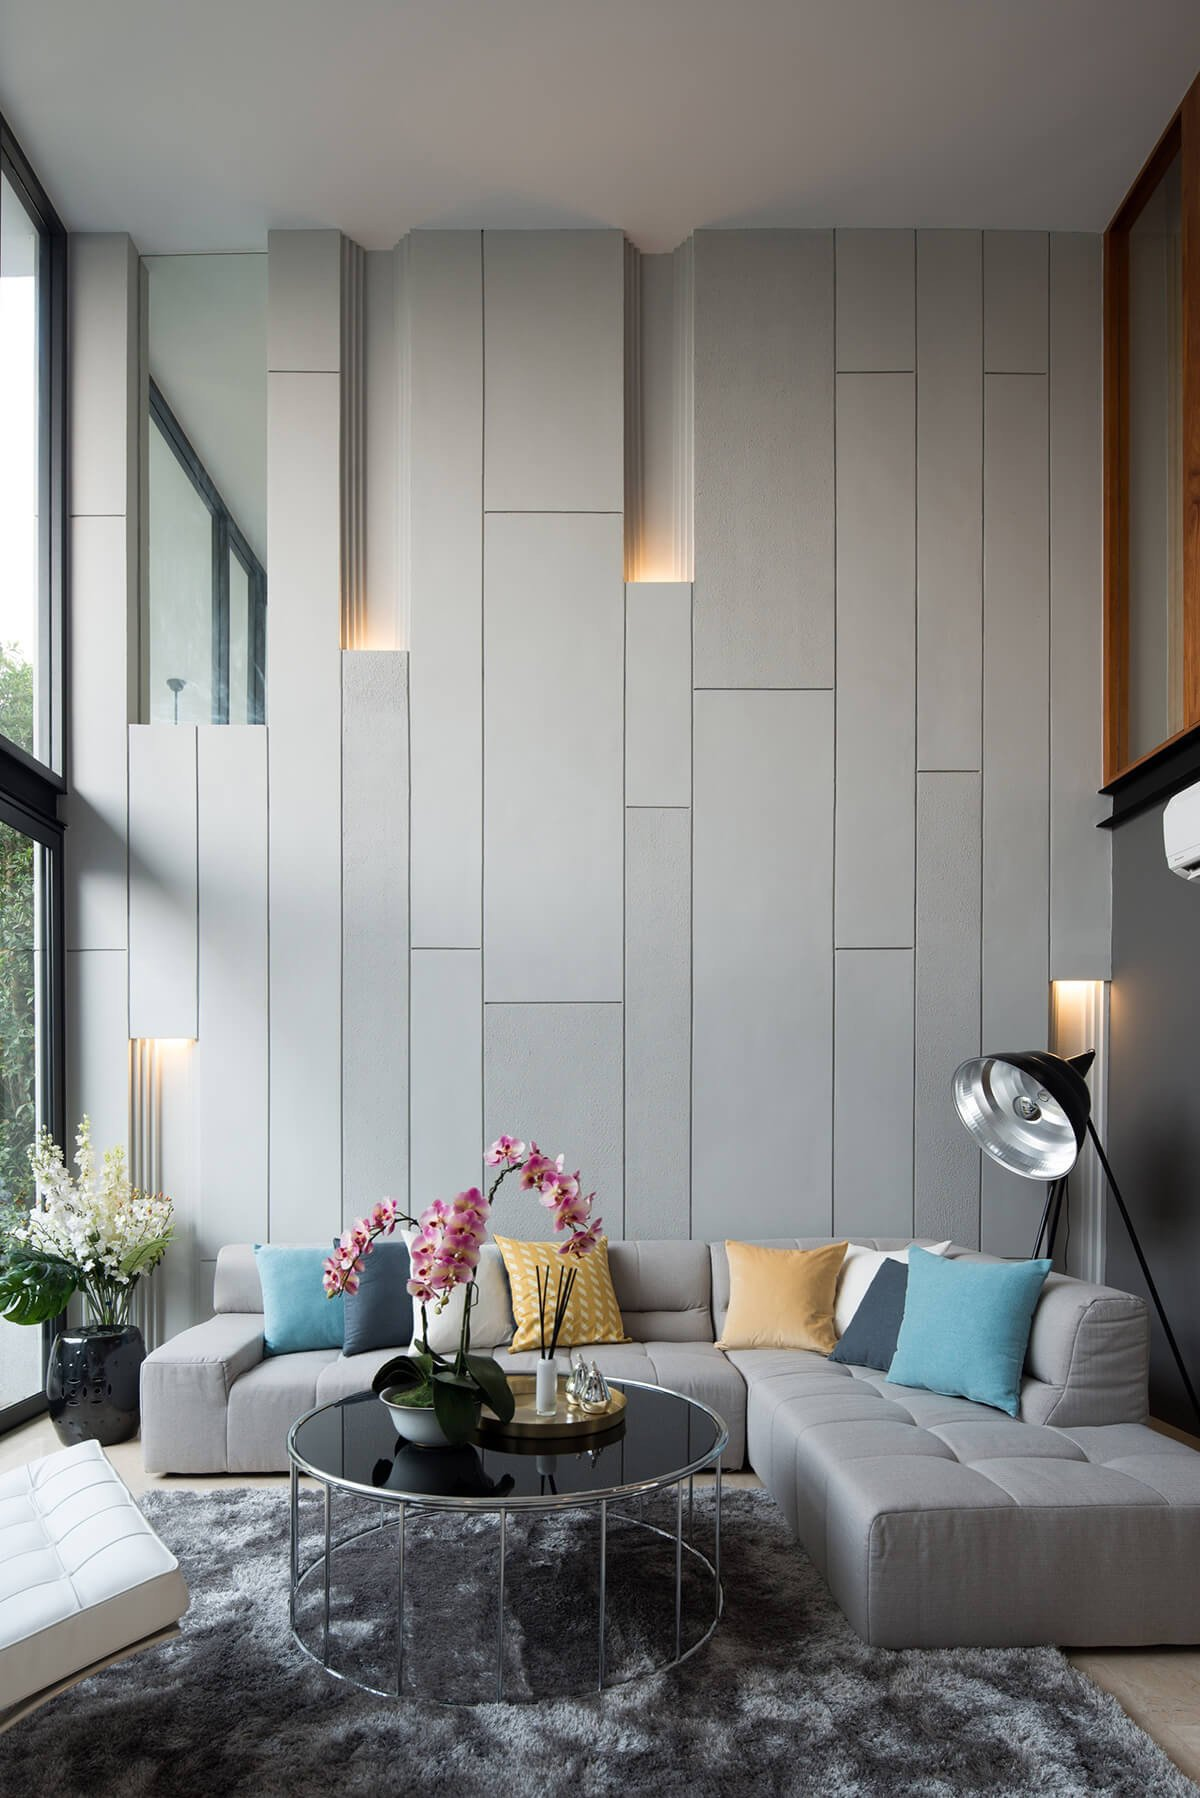 Modern Living Room Decor Ideas Inspirational 26 Best Modern Living Room Decorating Ideas and Designs